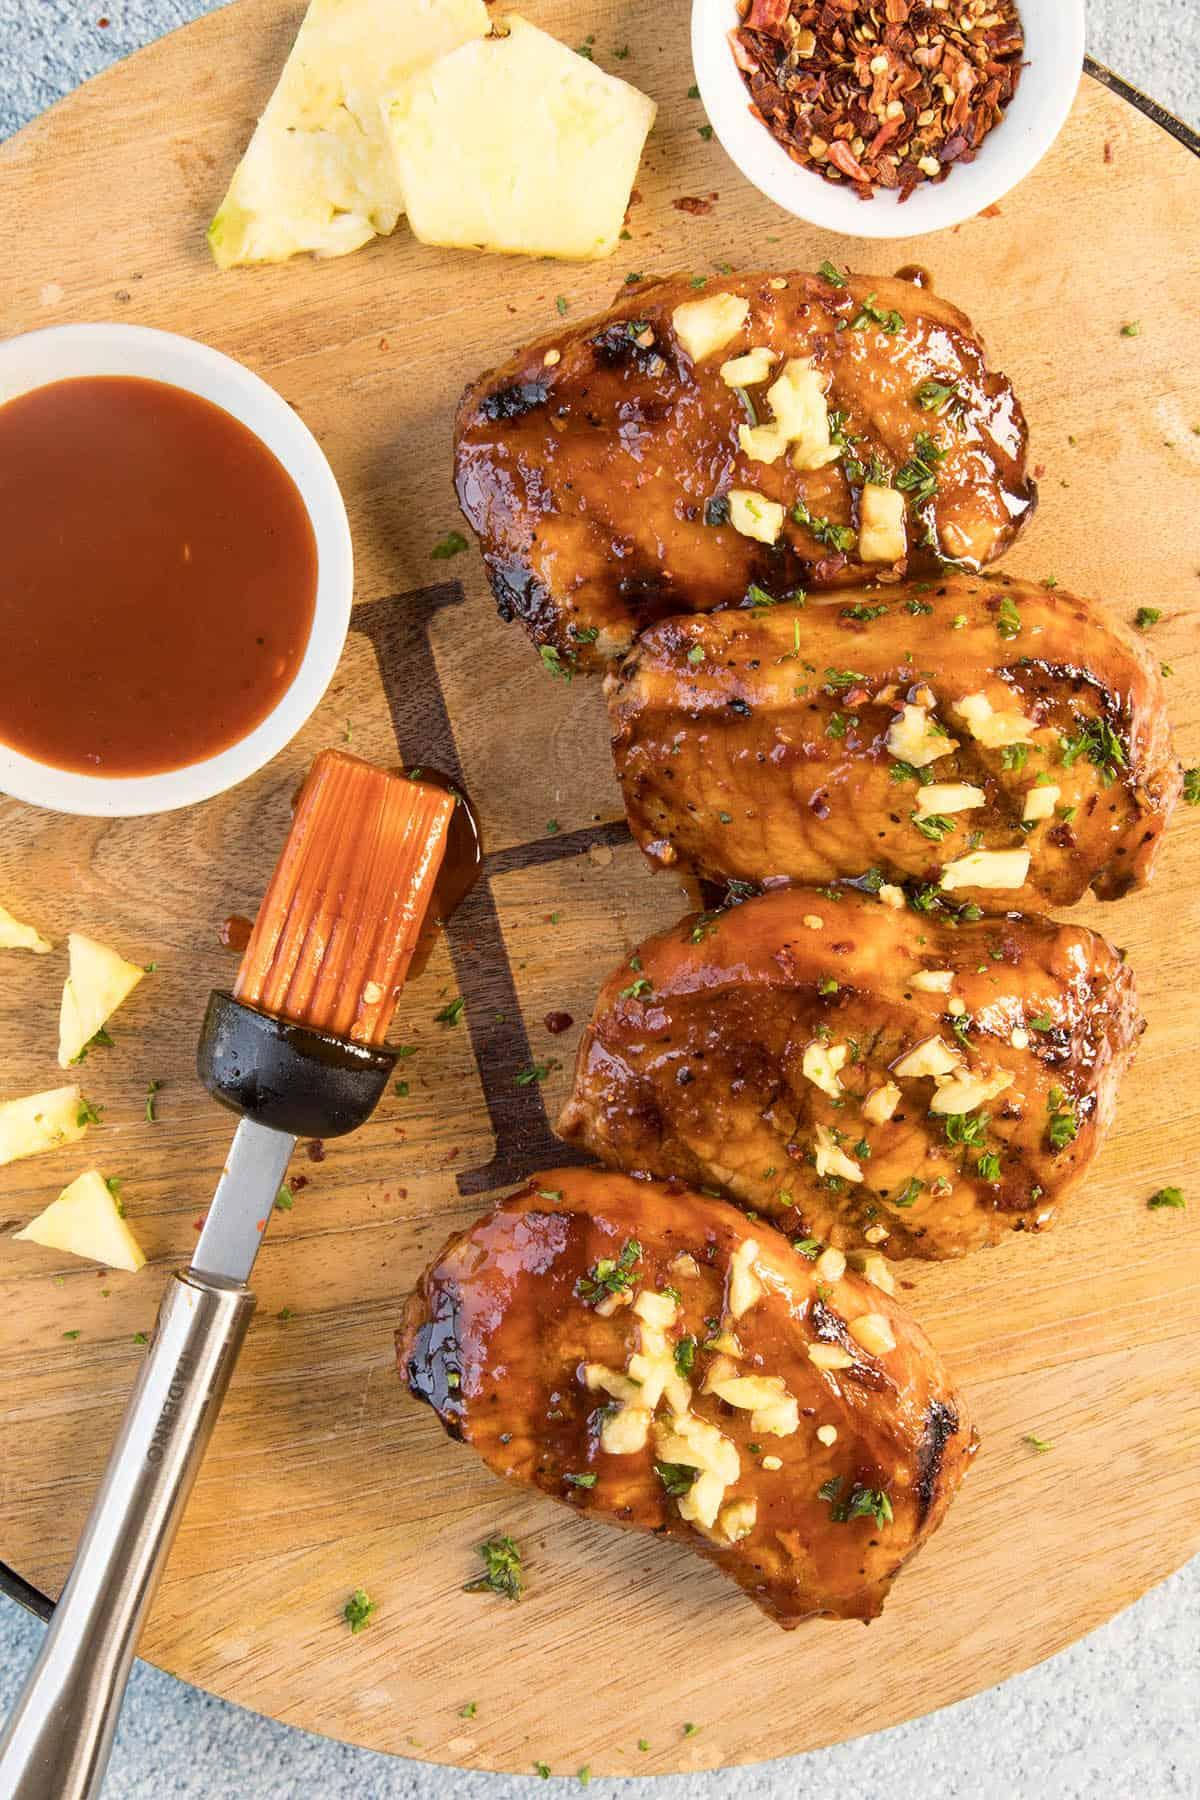 Grilled Pork Chops with Pineapple-Gochujang Glaze on a platter, ready to serve